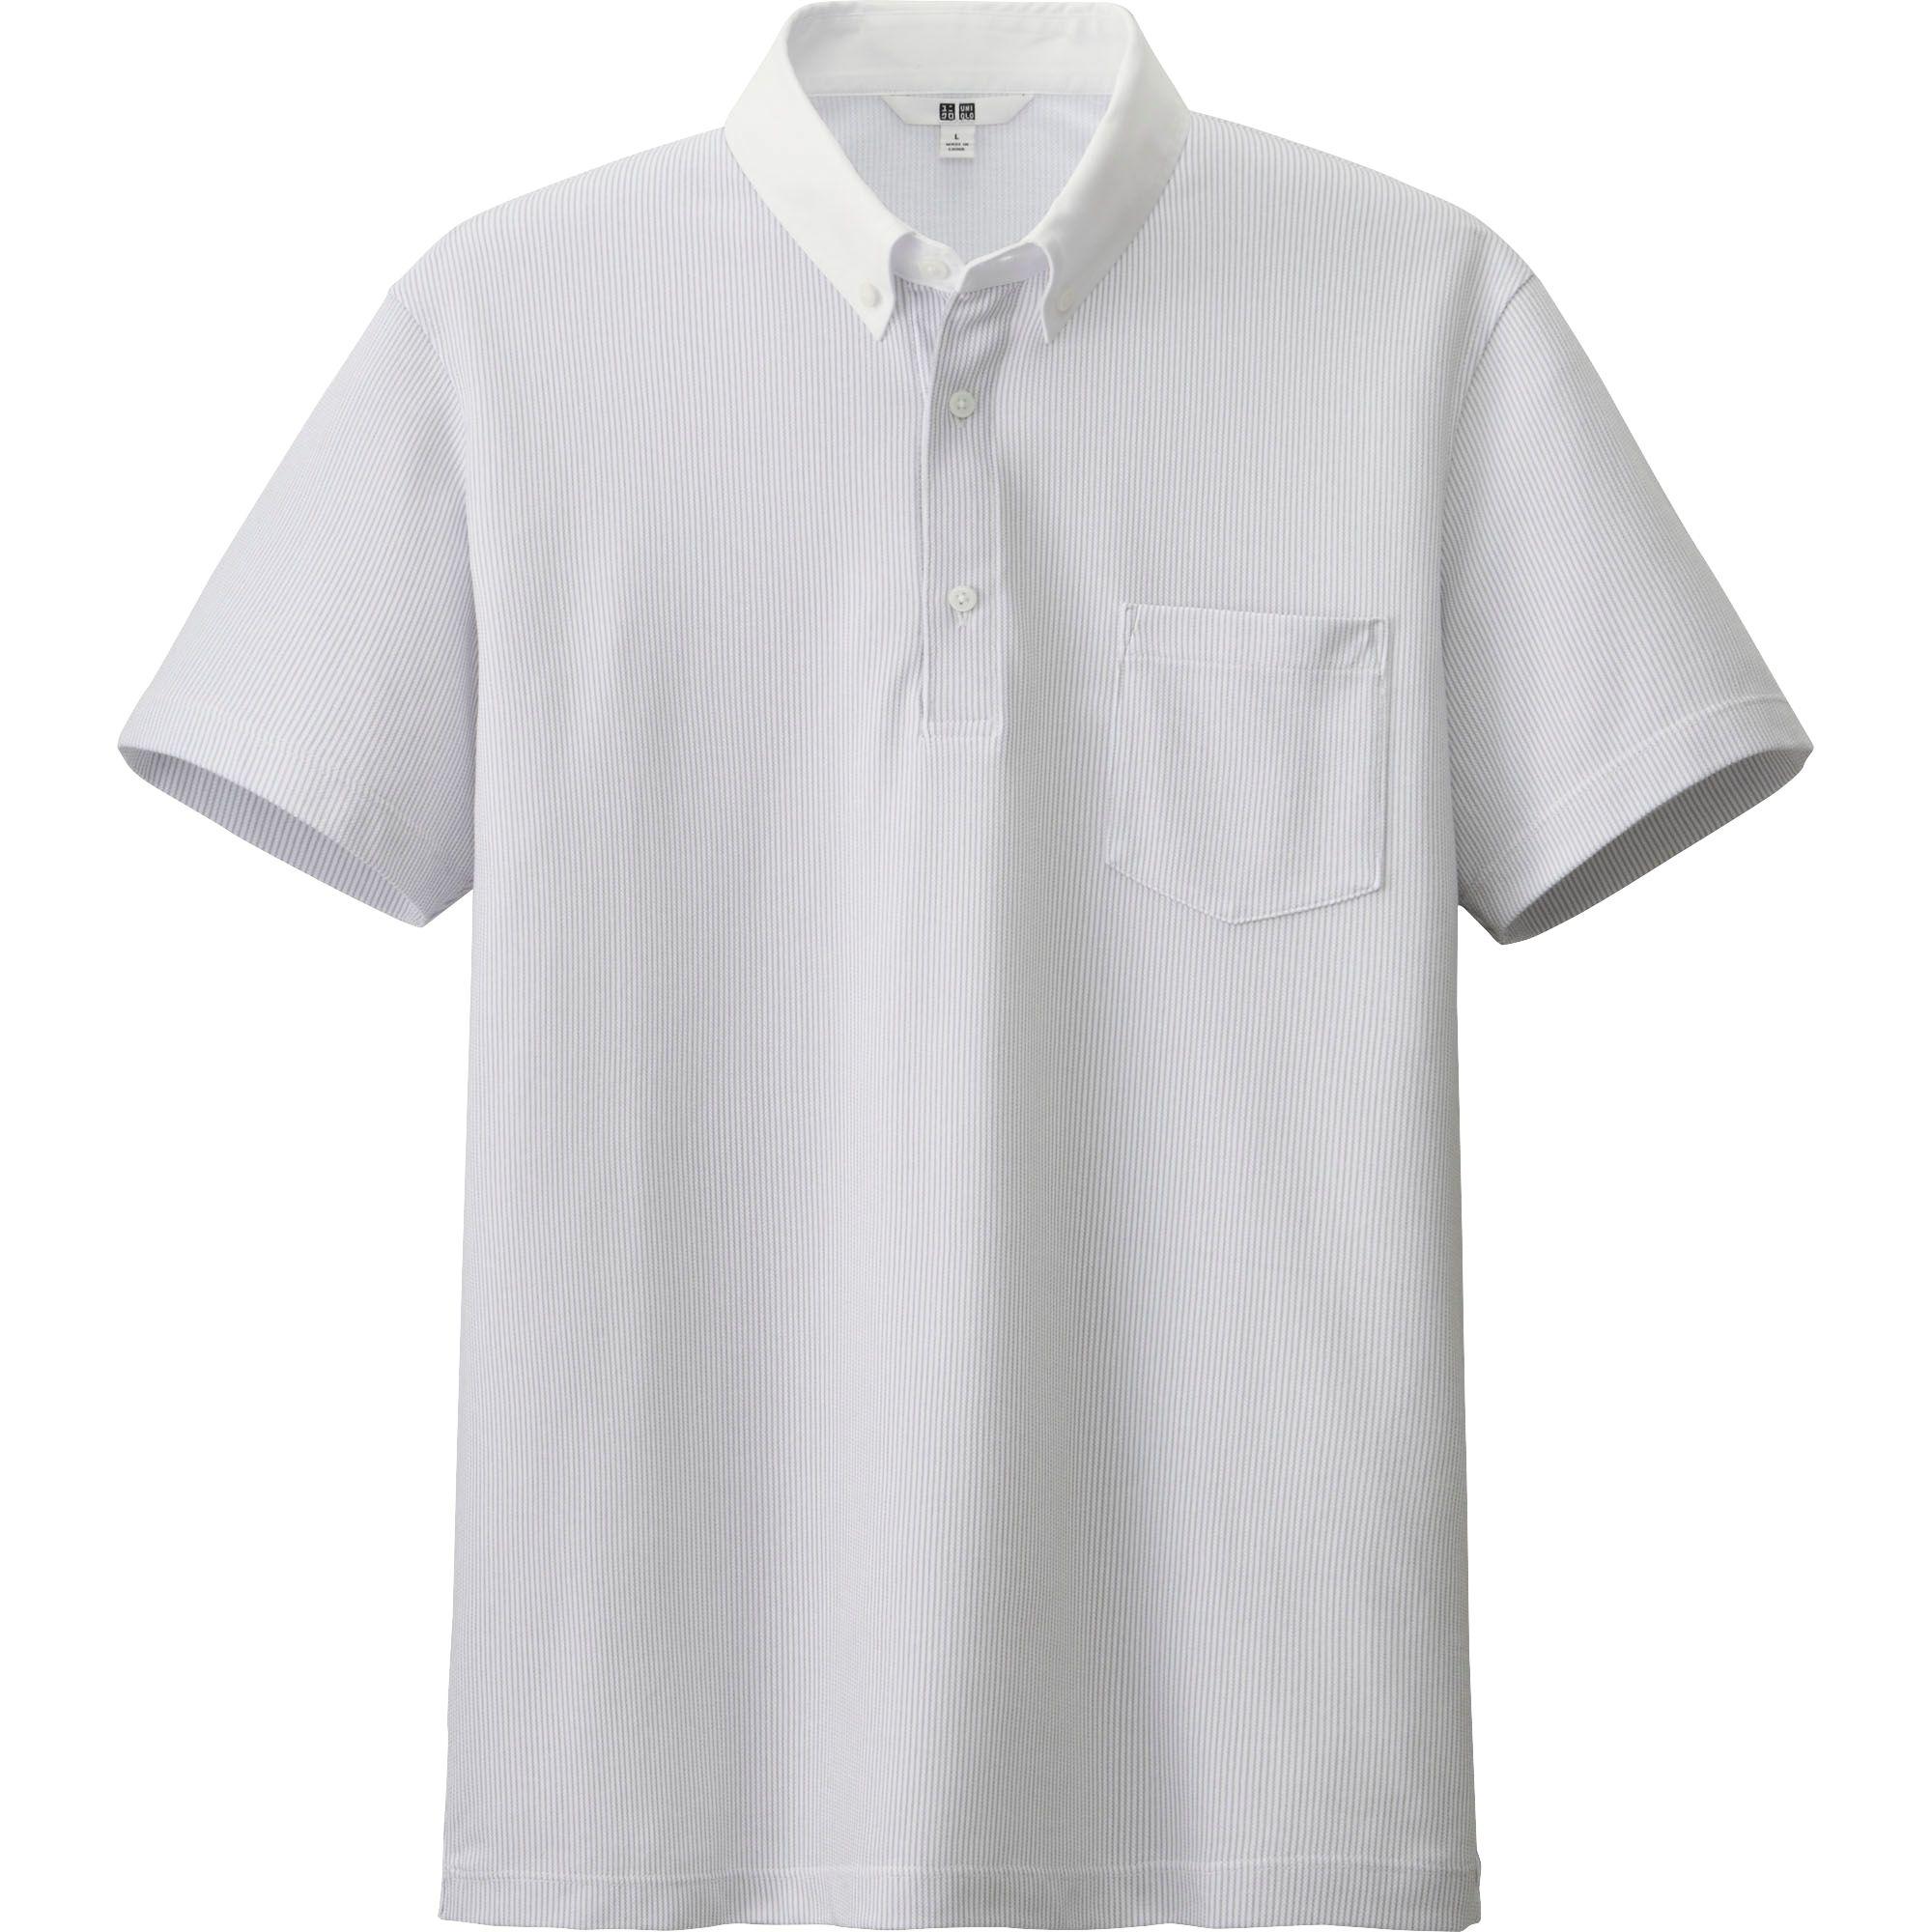 Uniqlo men 39 s shirt sizing jumpers sale for Uniqlo t shirt sizing